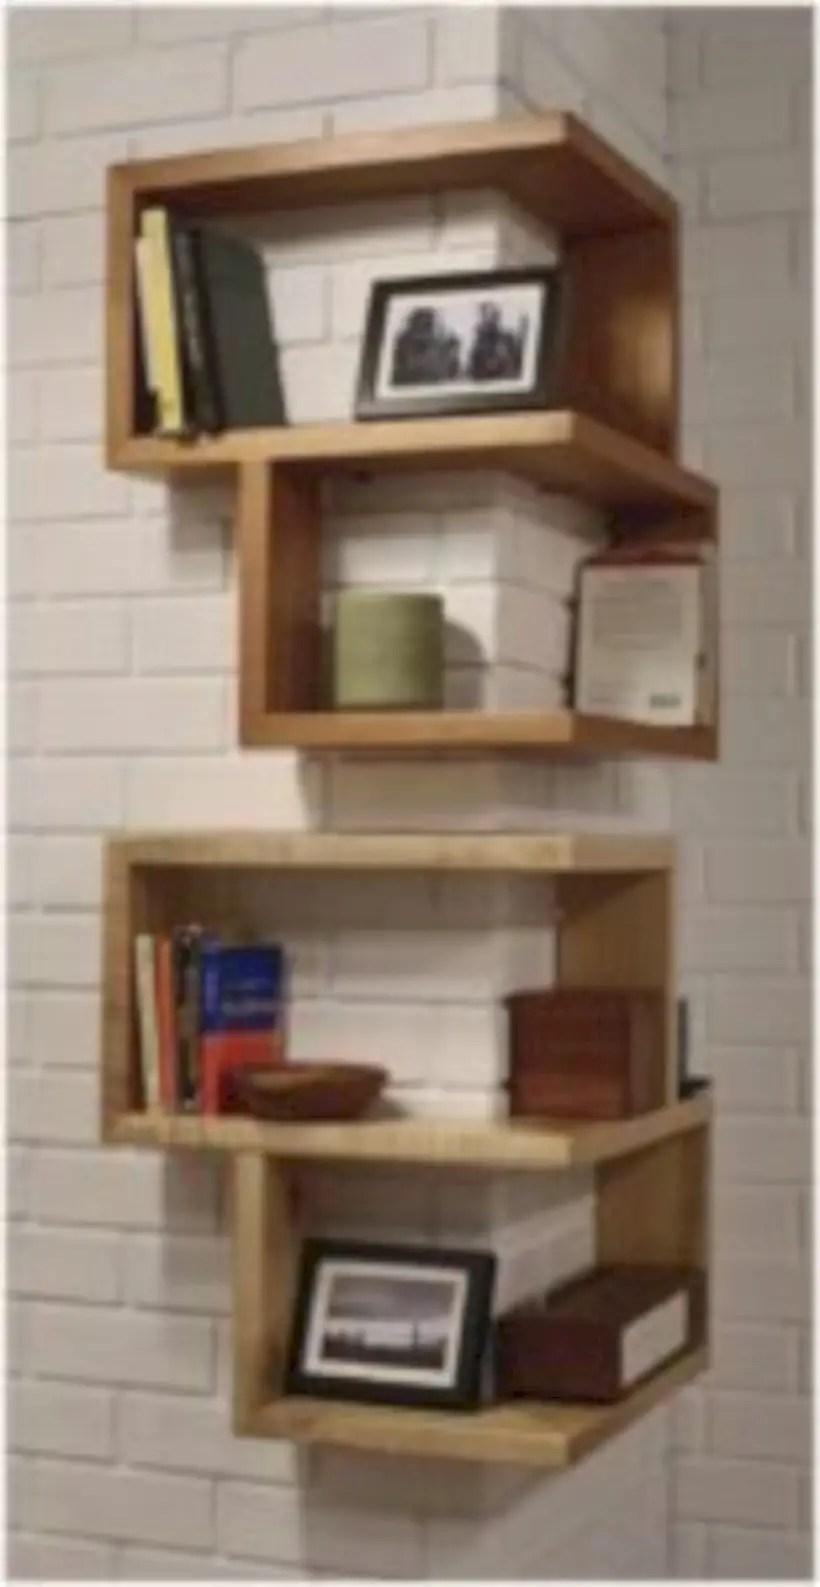 Diy wall shelves ideas for living room decoration 34